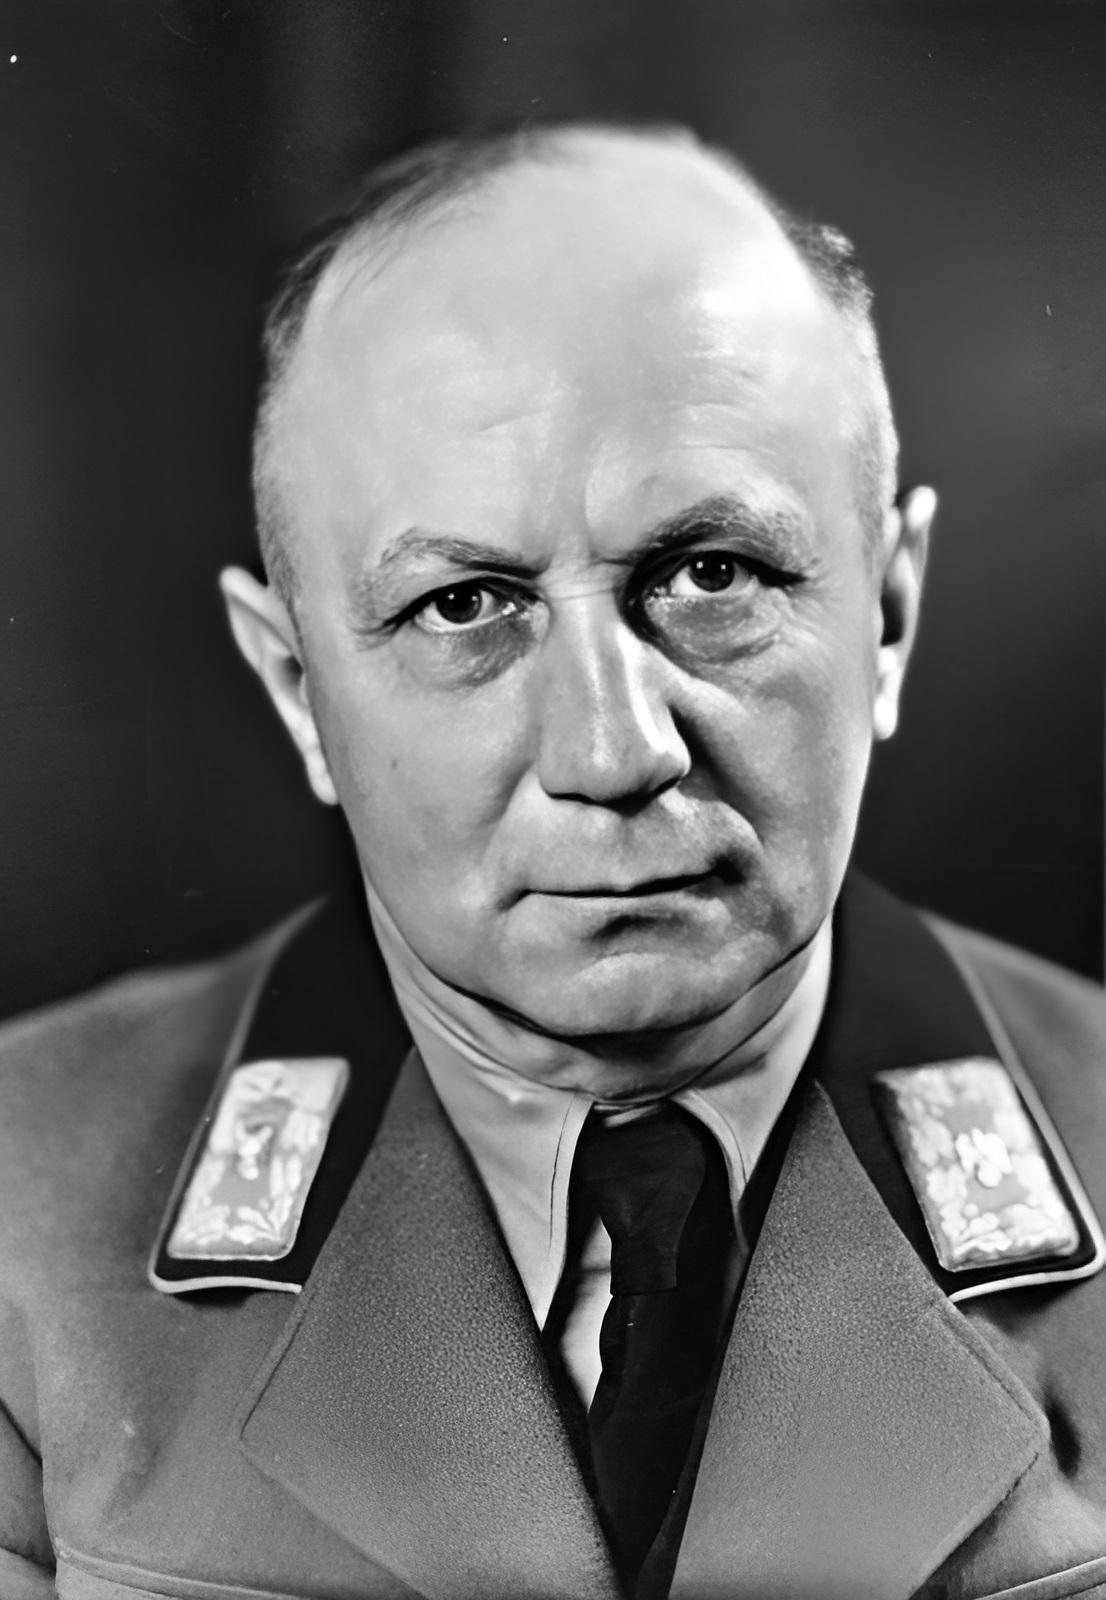 https://upload.wikimedia.org/wikipedia/commons/3/35/Bundesarchiv_Bild_183-2007-0821-500%2C_Wilhelm_Kube.jpg